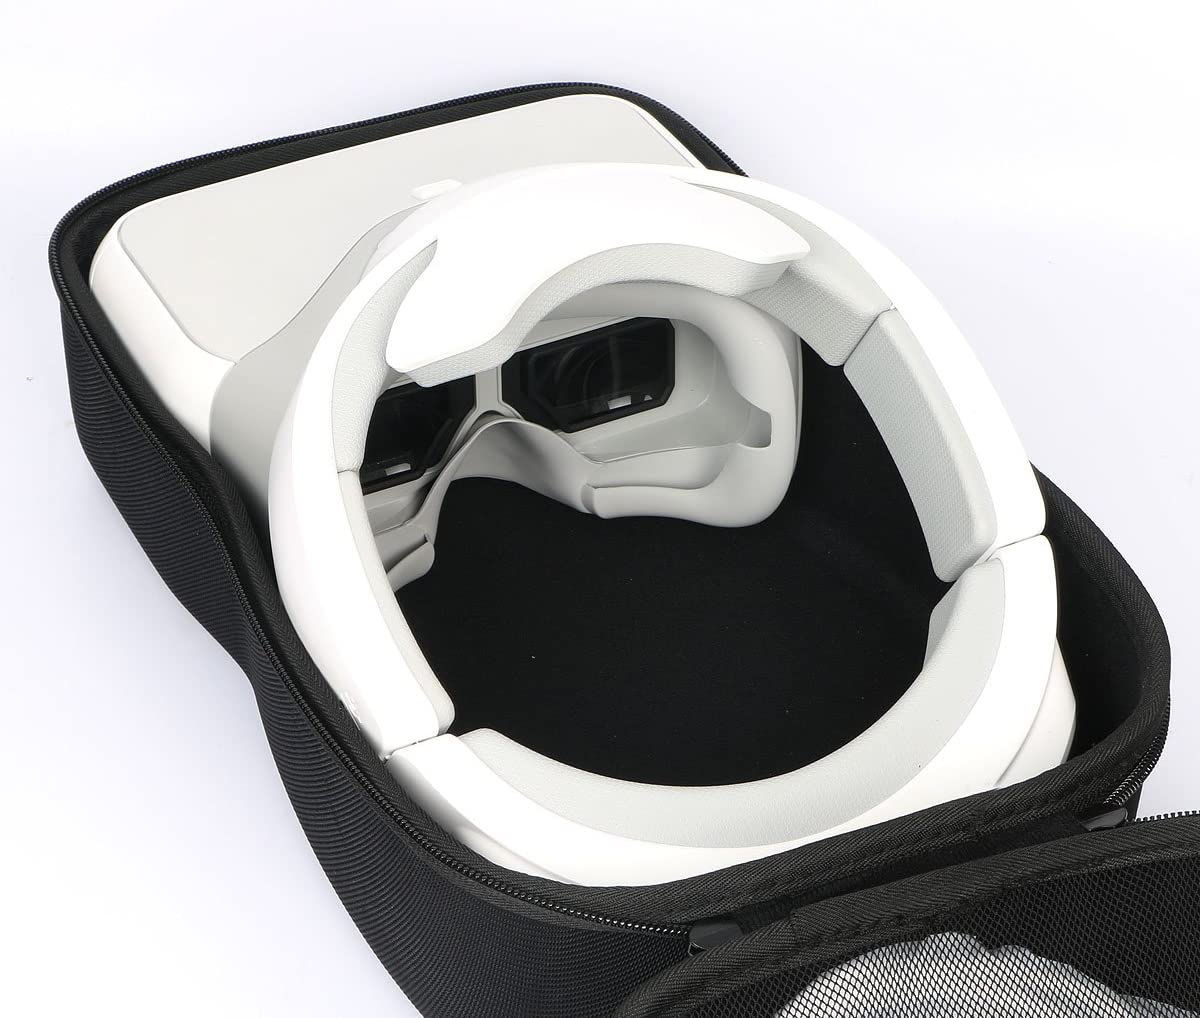 Khanka Hart Reise Tasche Case Für Dji Goggles Vr Elektronik